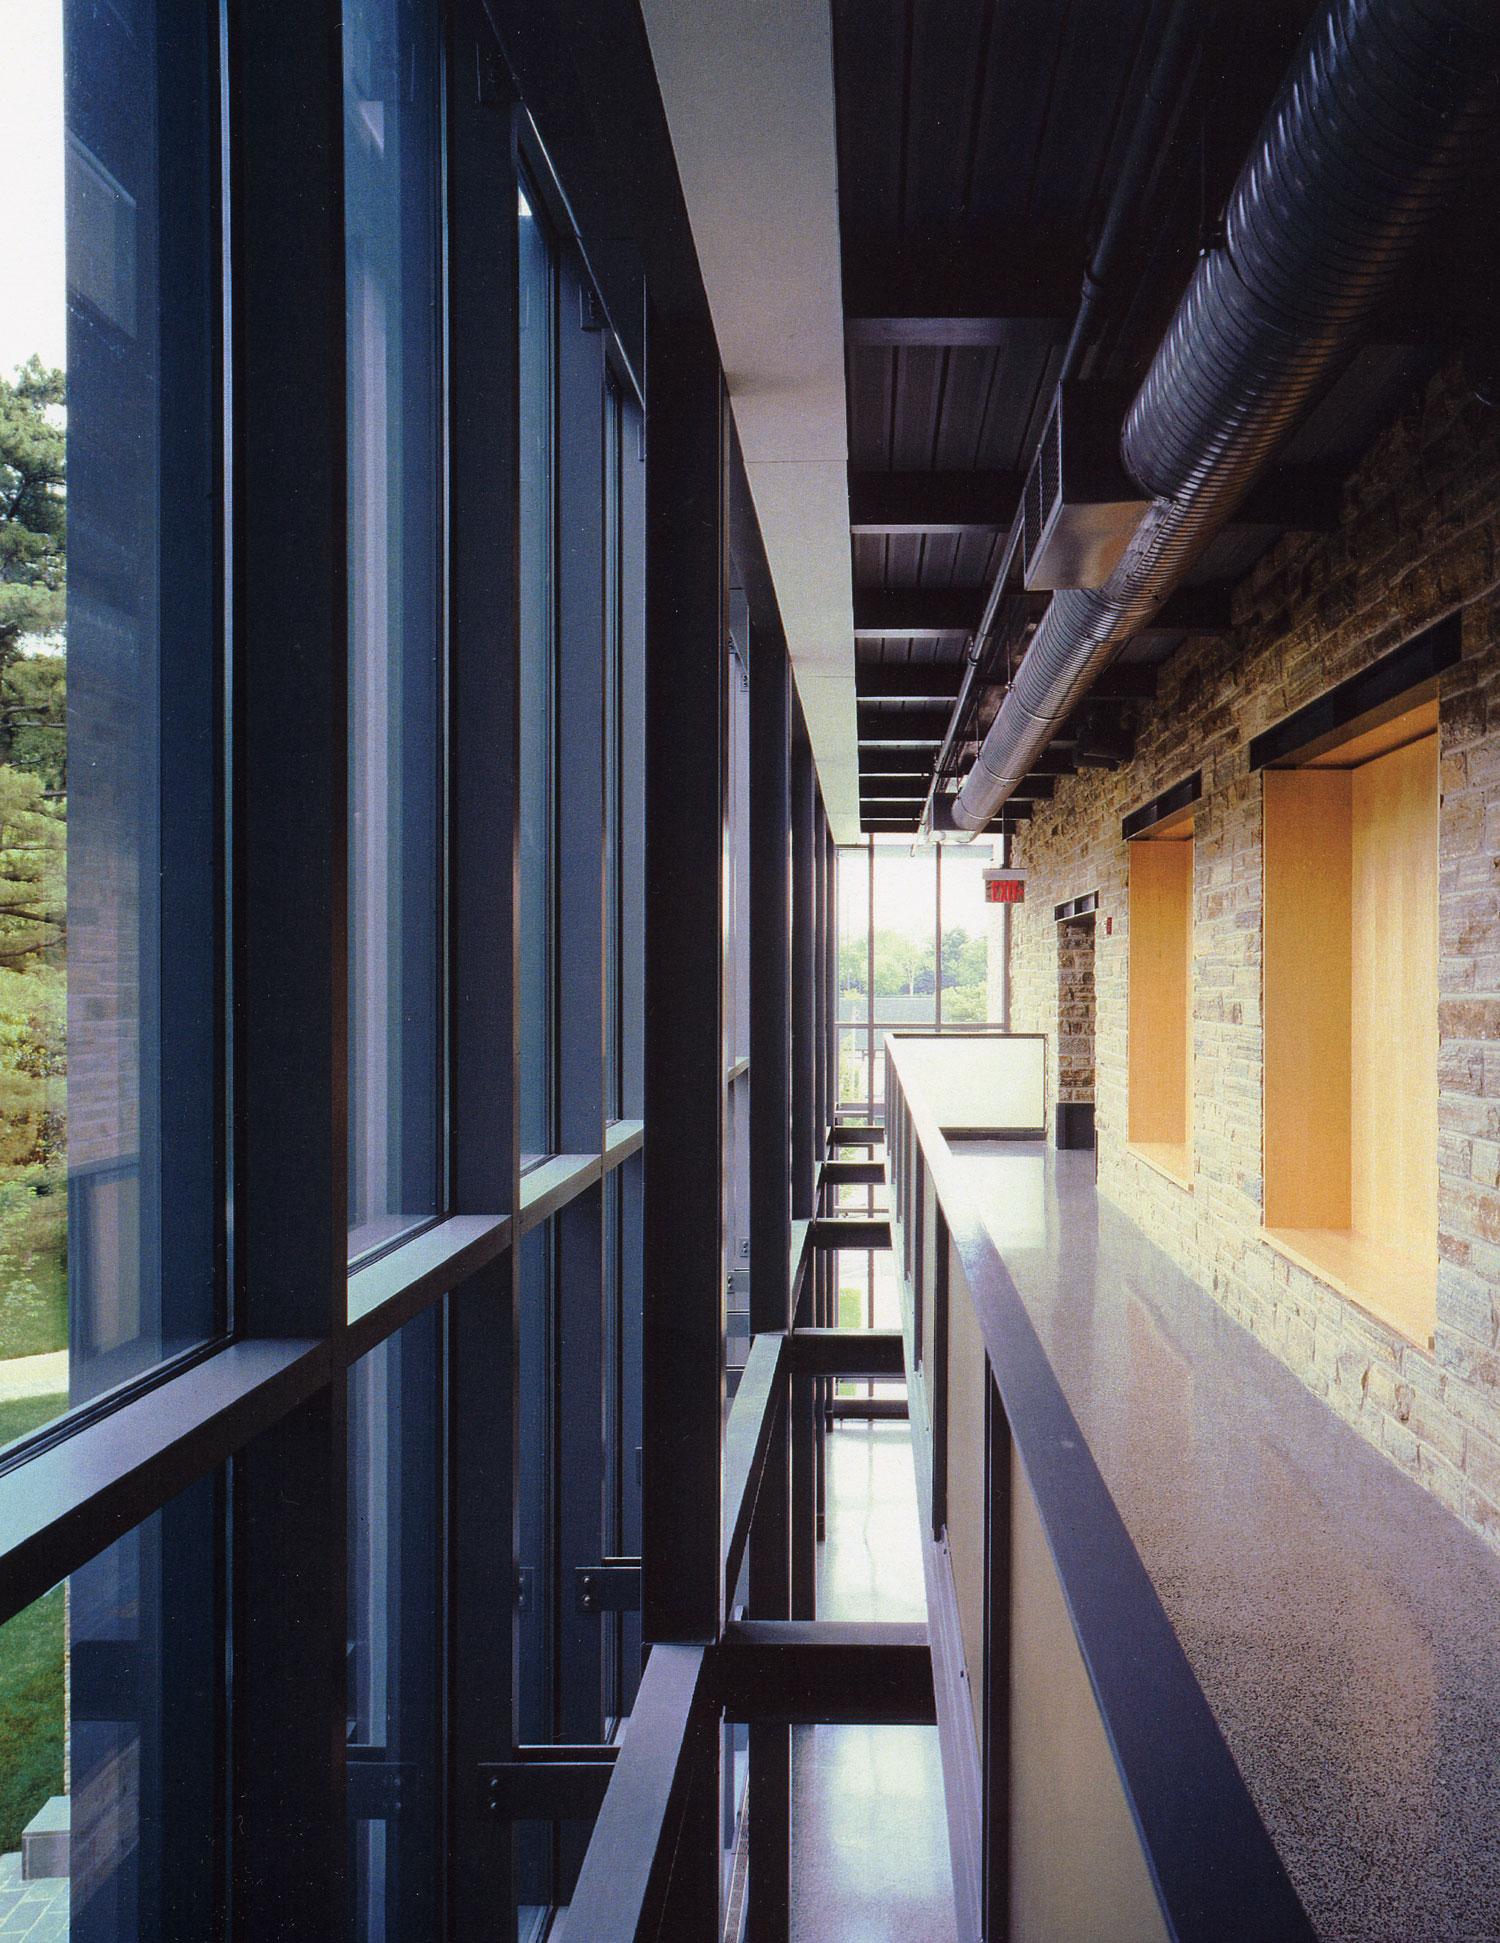 04KD-interior-hallway-2.jpg